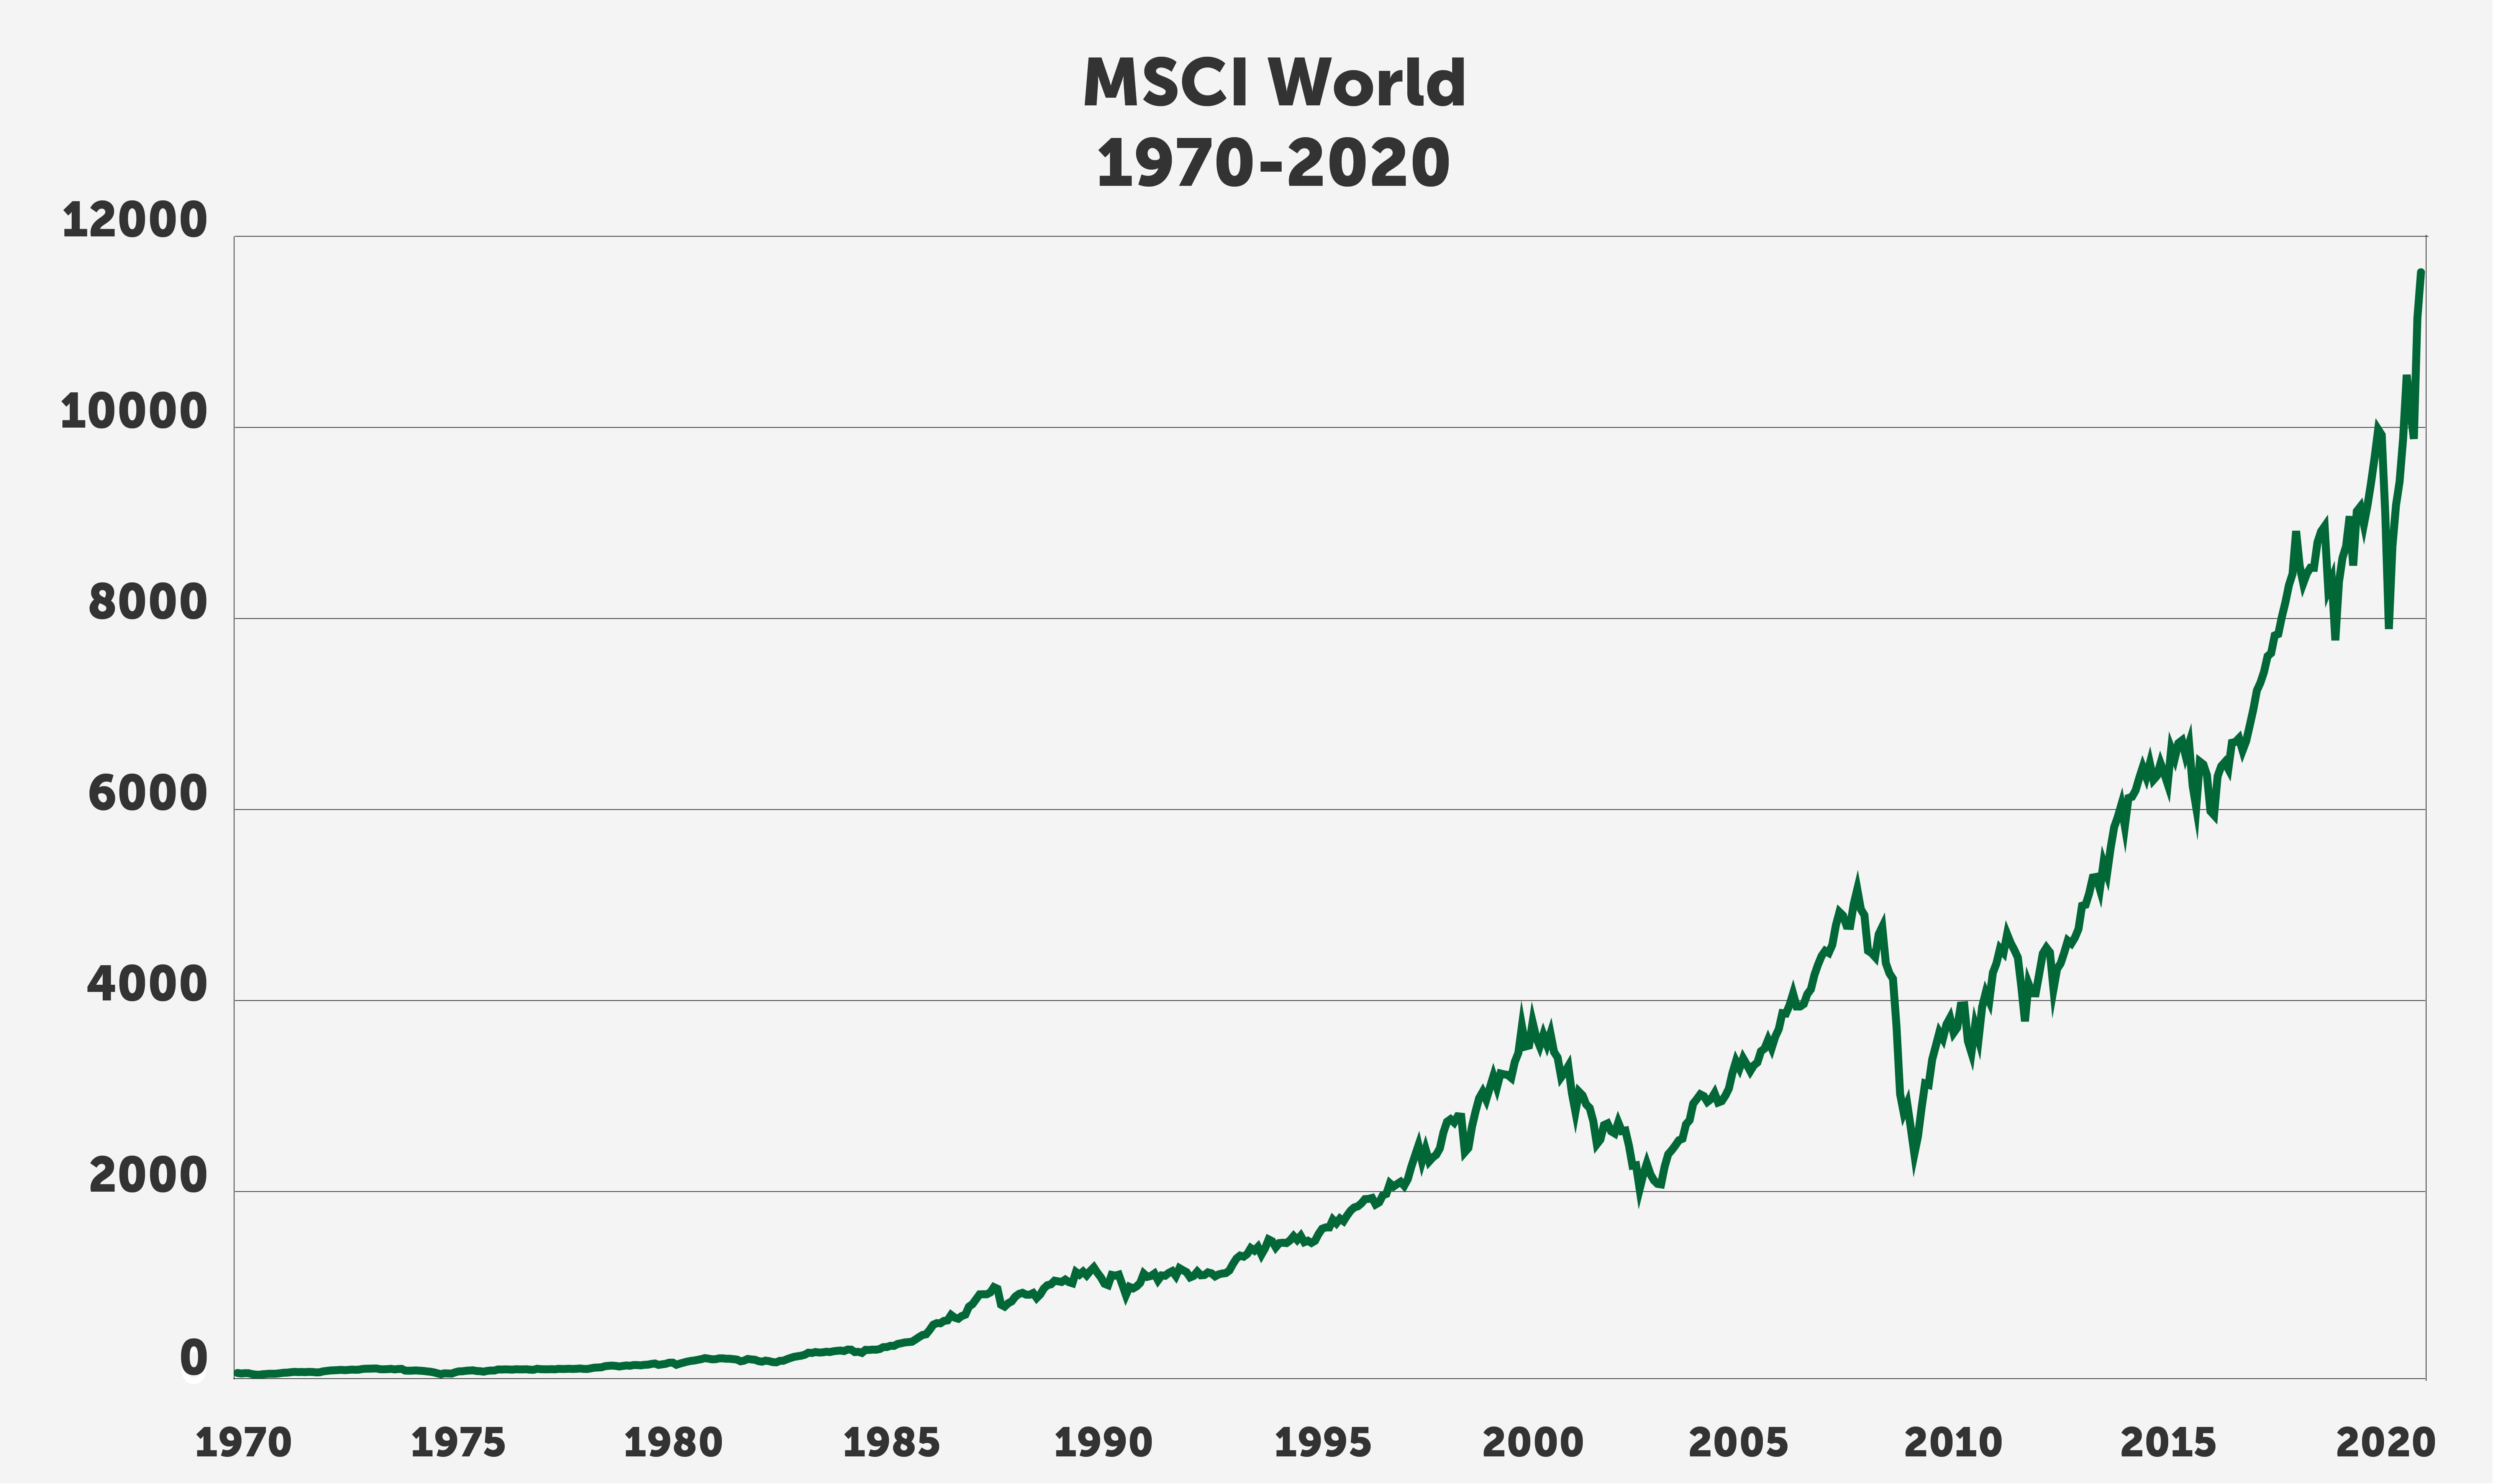 MSCI World 1970-2020